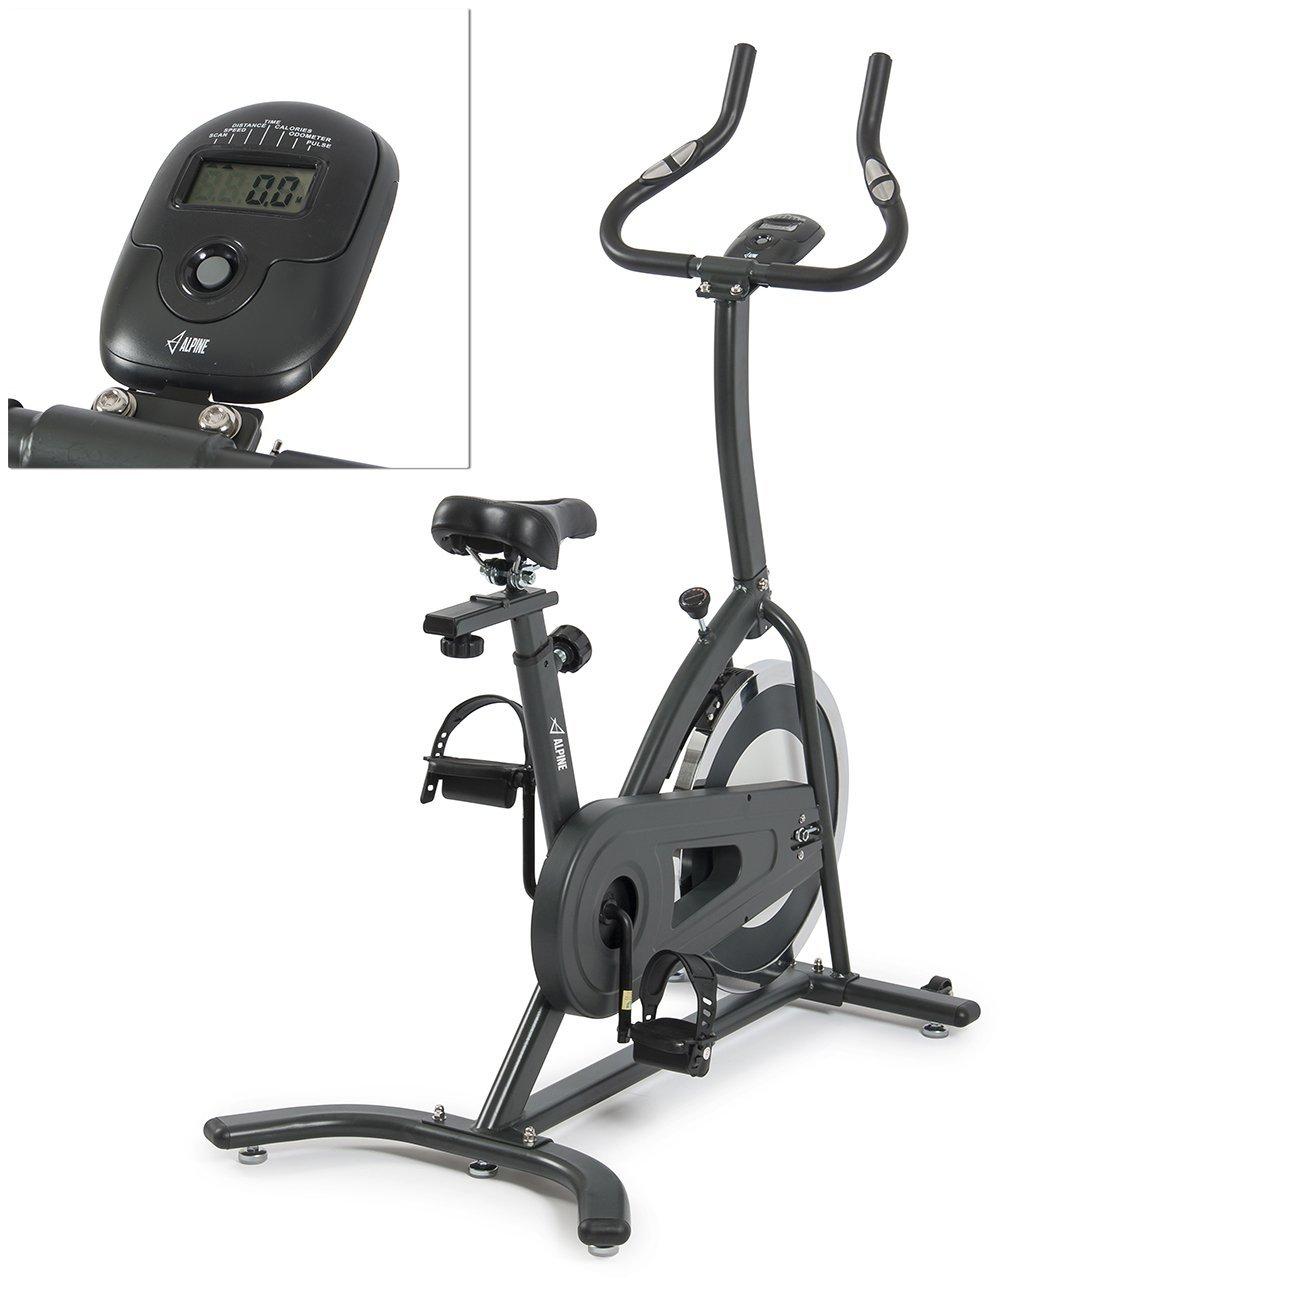 ALPINE Exercise Bike Indoor Cardio